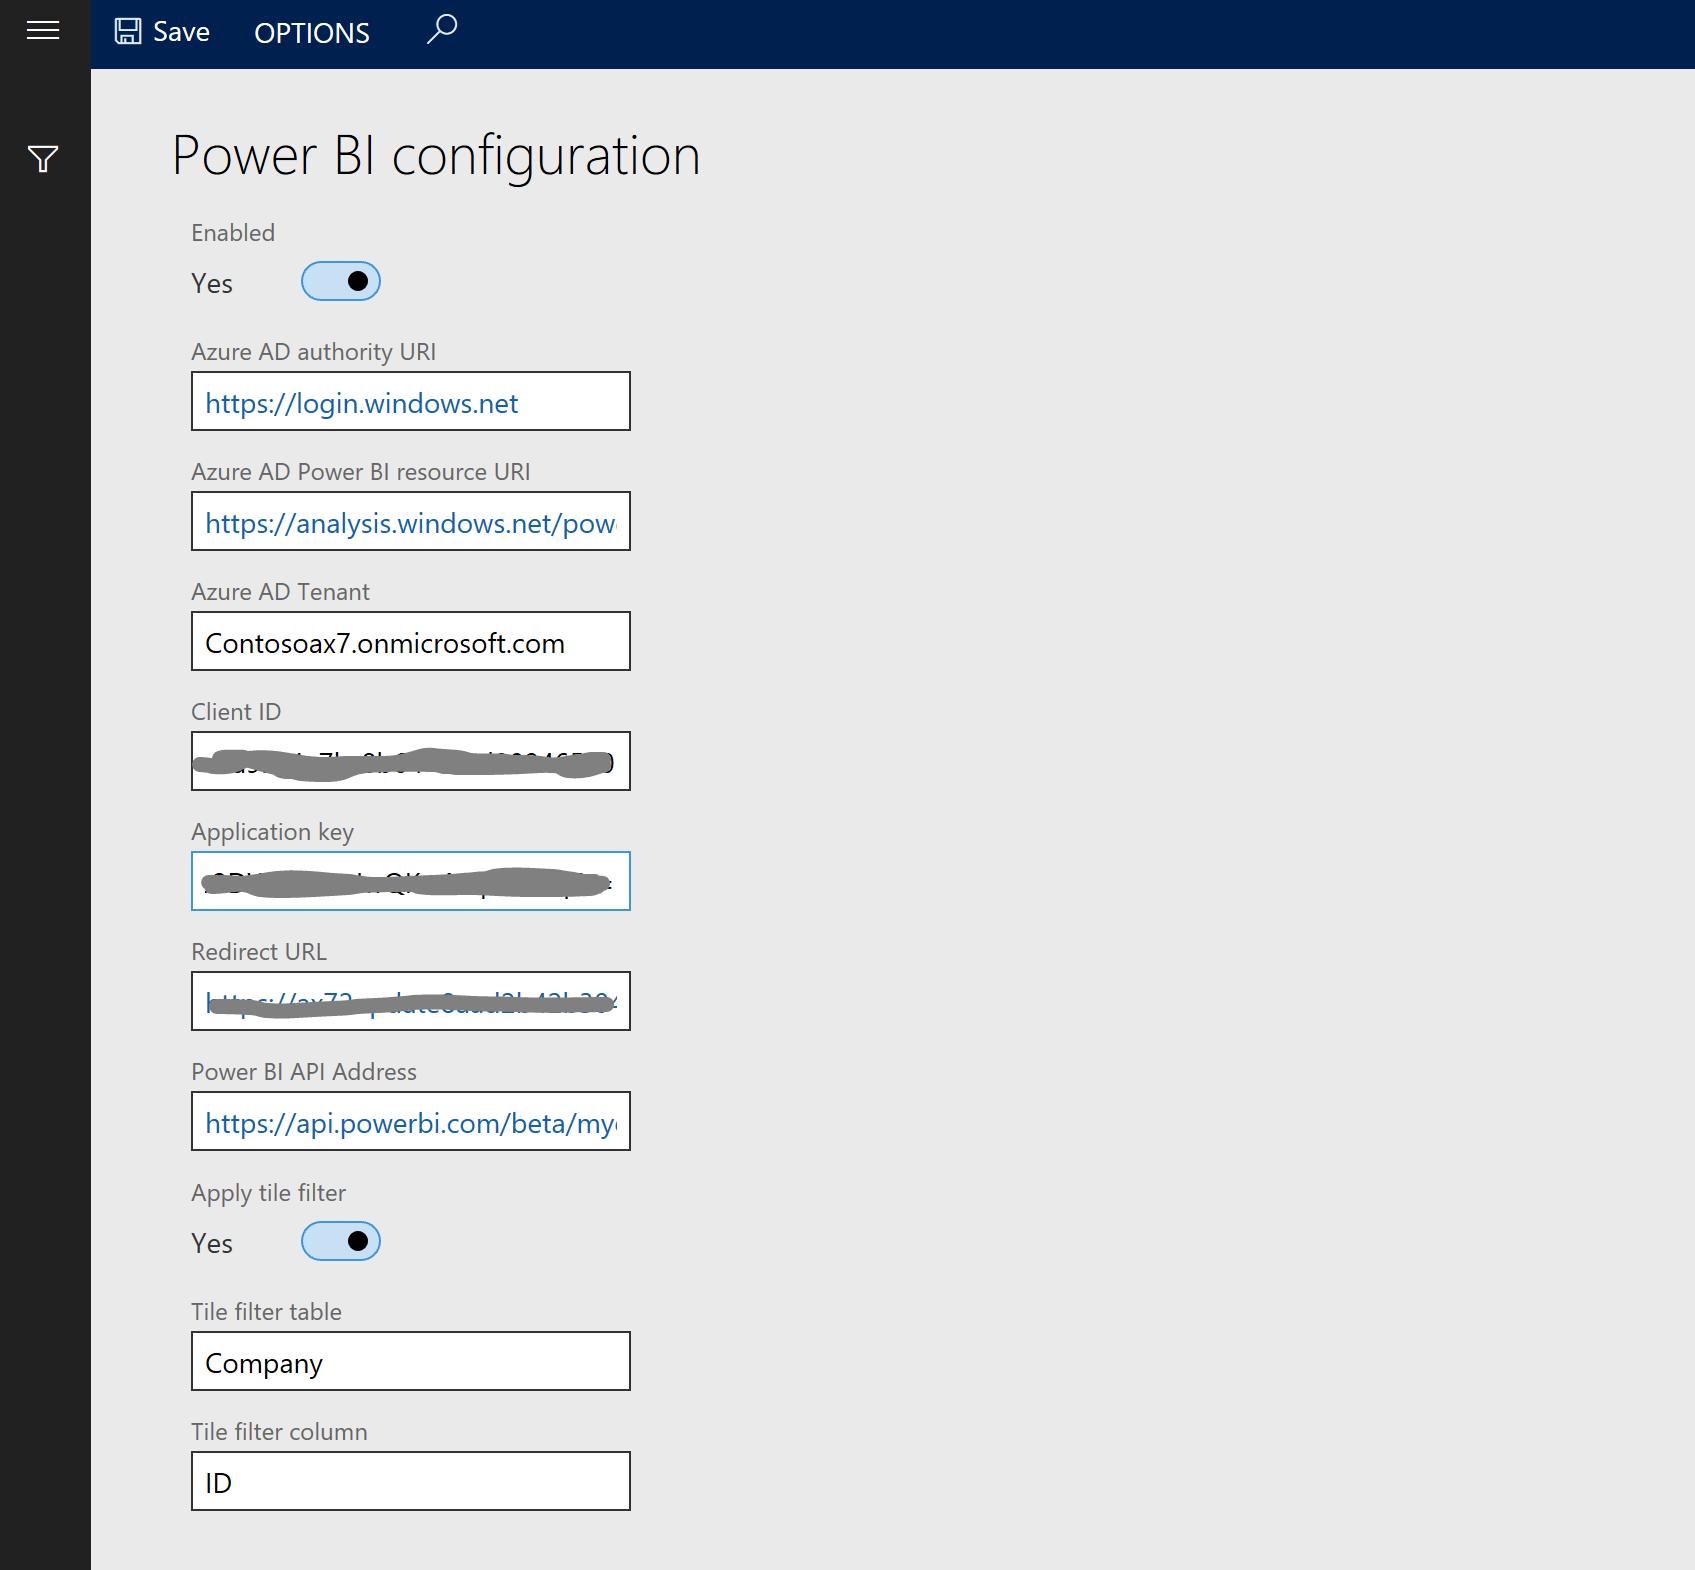 Configure Power BI integration for workspaces - Finance & Operations ...